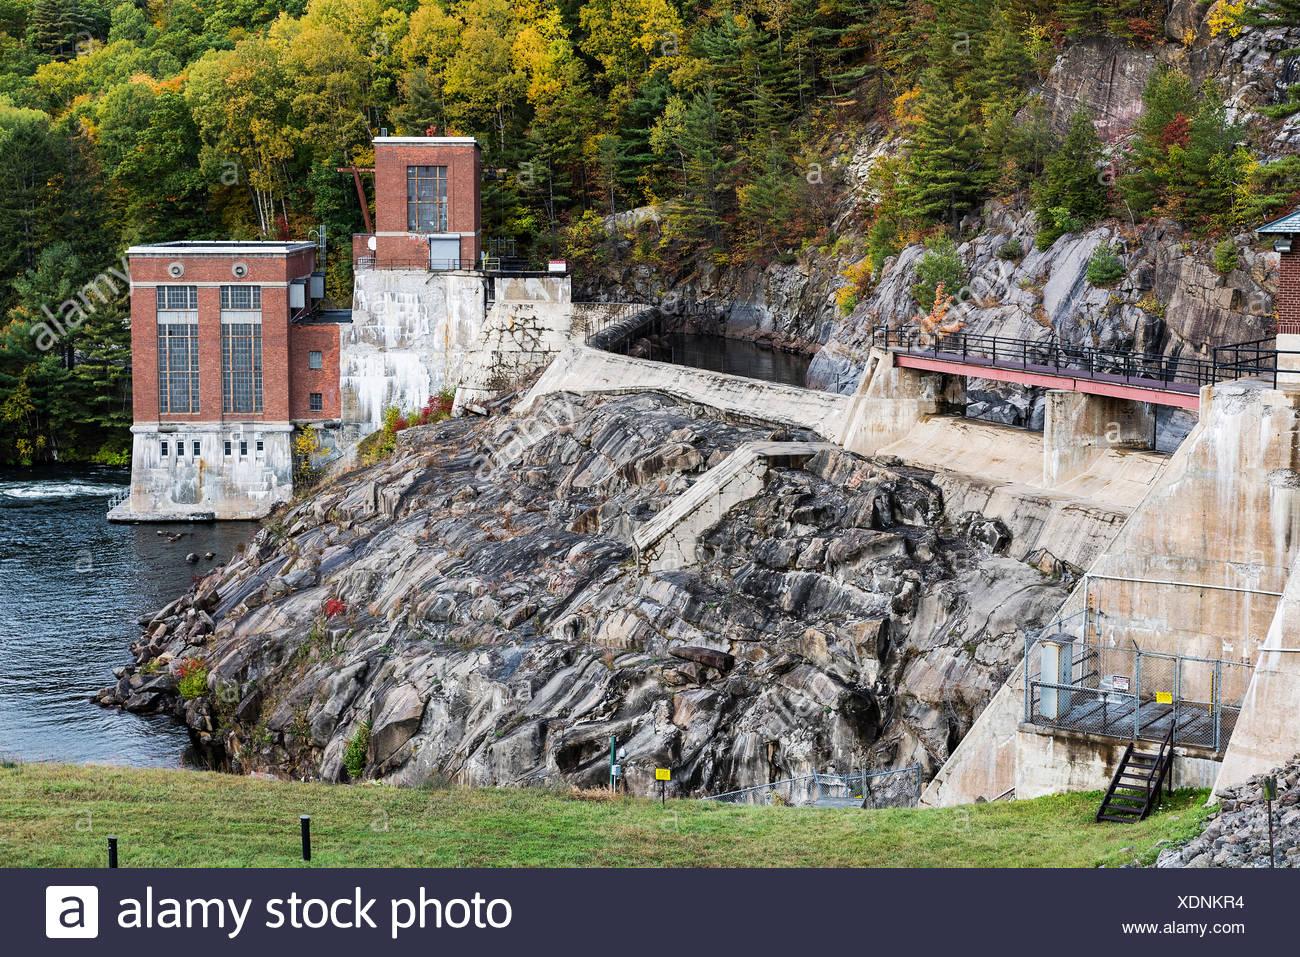 The Conklingville Dam, in Hadley, Saratoga County, New York, USA. - Stock Image